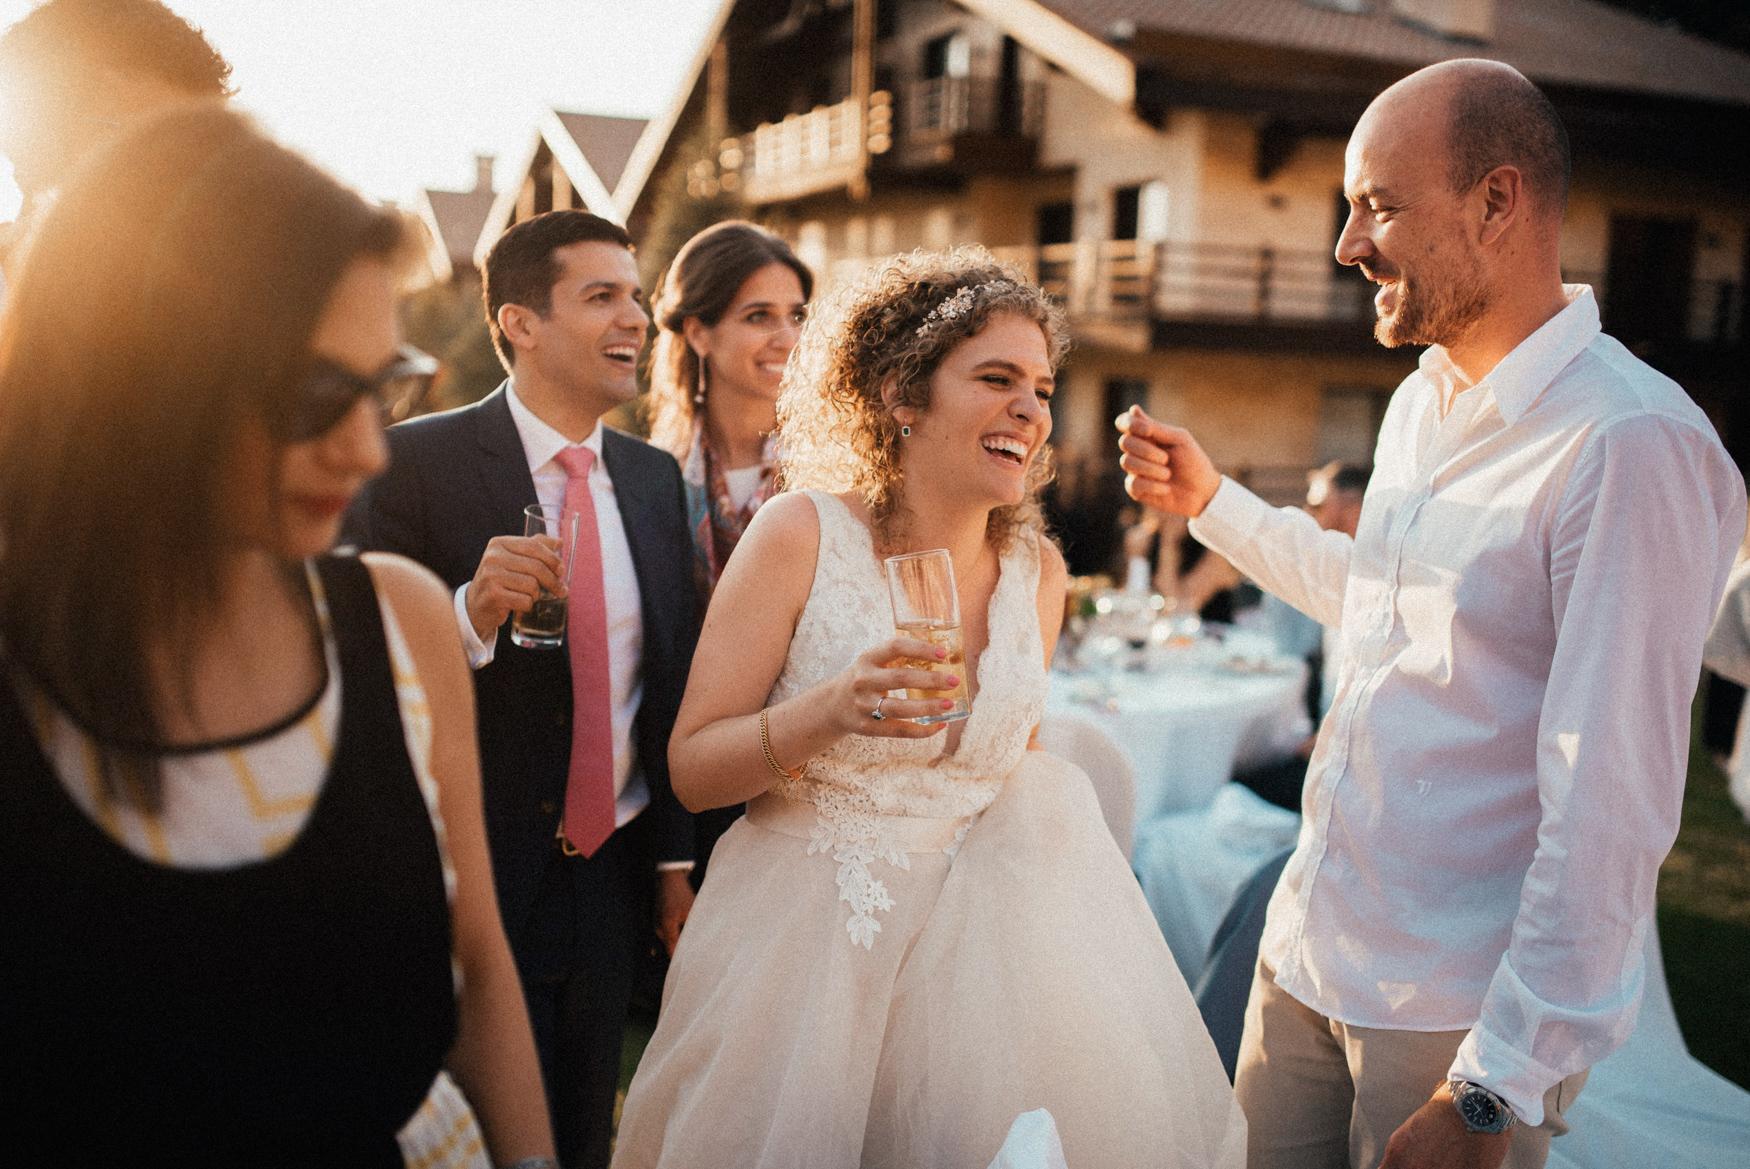 LR5 beirut lebanon mzaar intercontinental wedding photographer 012.jpg